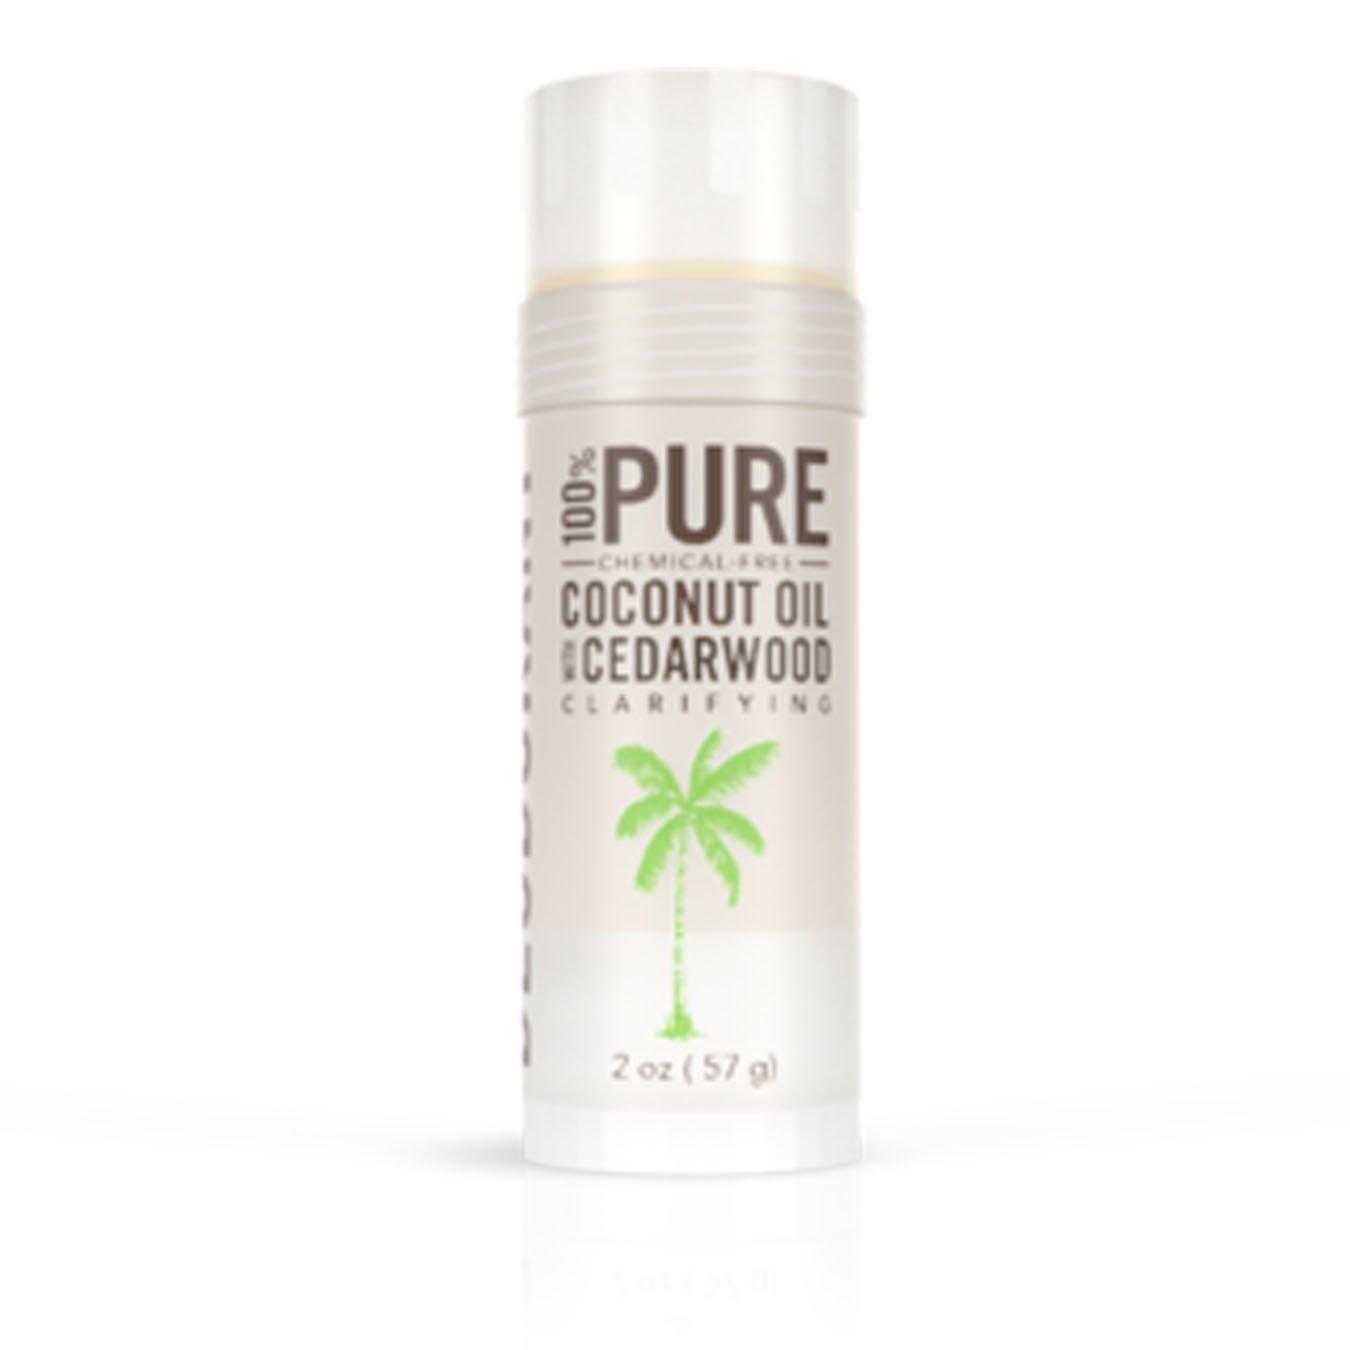 Skinny & Co. Natural Deodorant- Coconut Oil & Cedarwood (2 oz.)